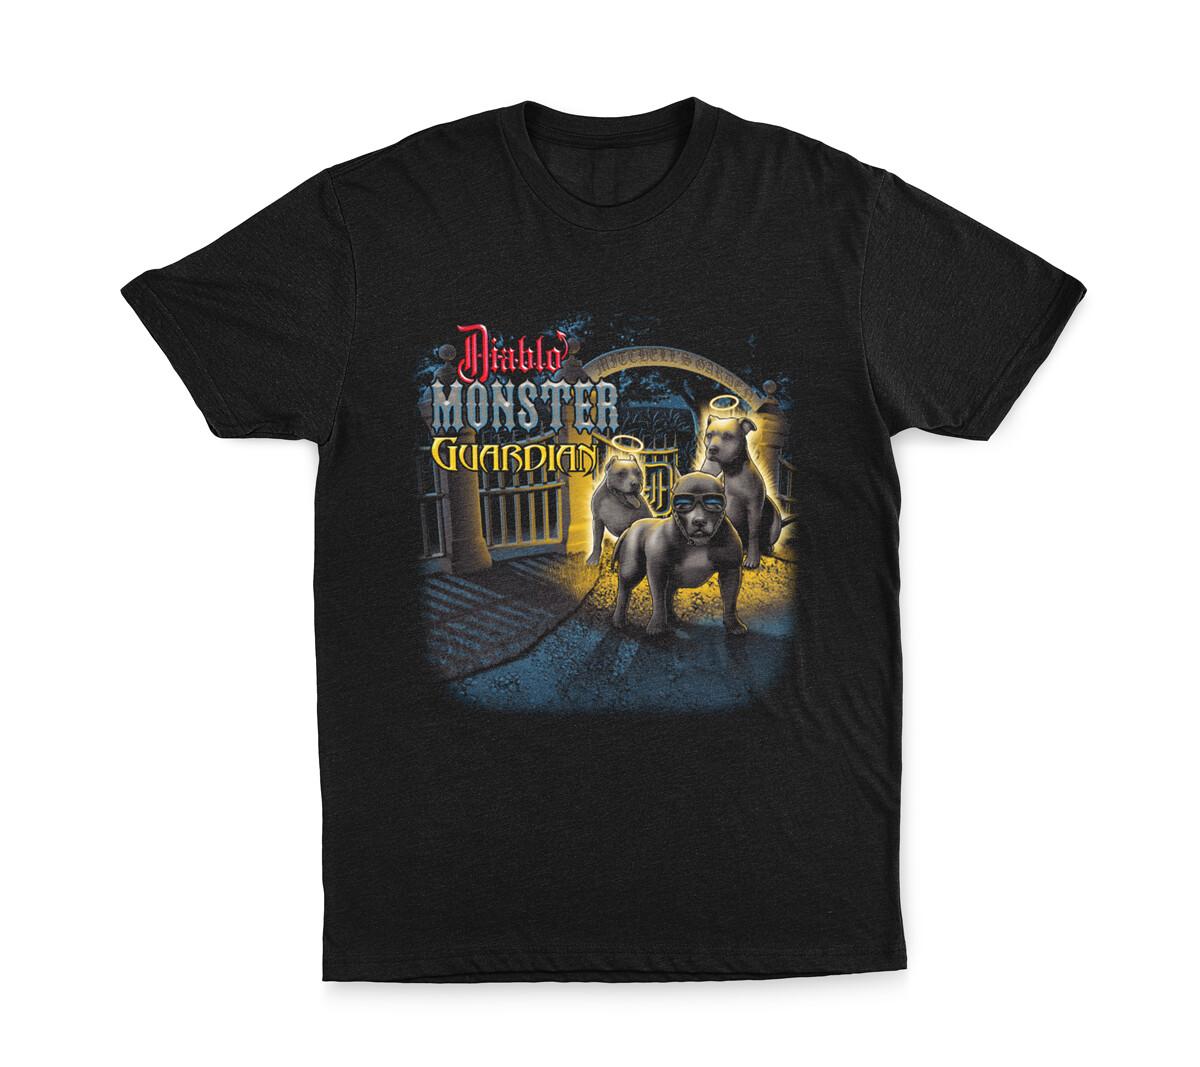 SIZE 5XL: Diablo Monster Guardian T-Shirt